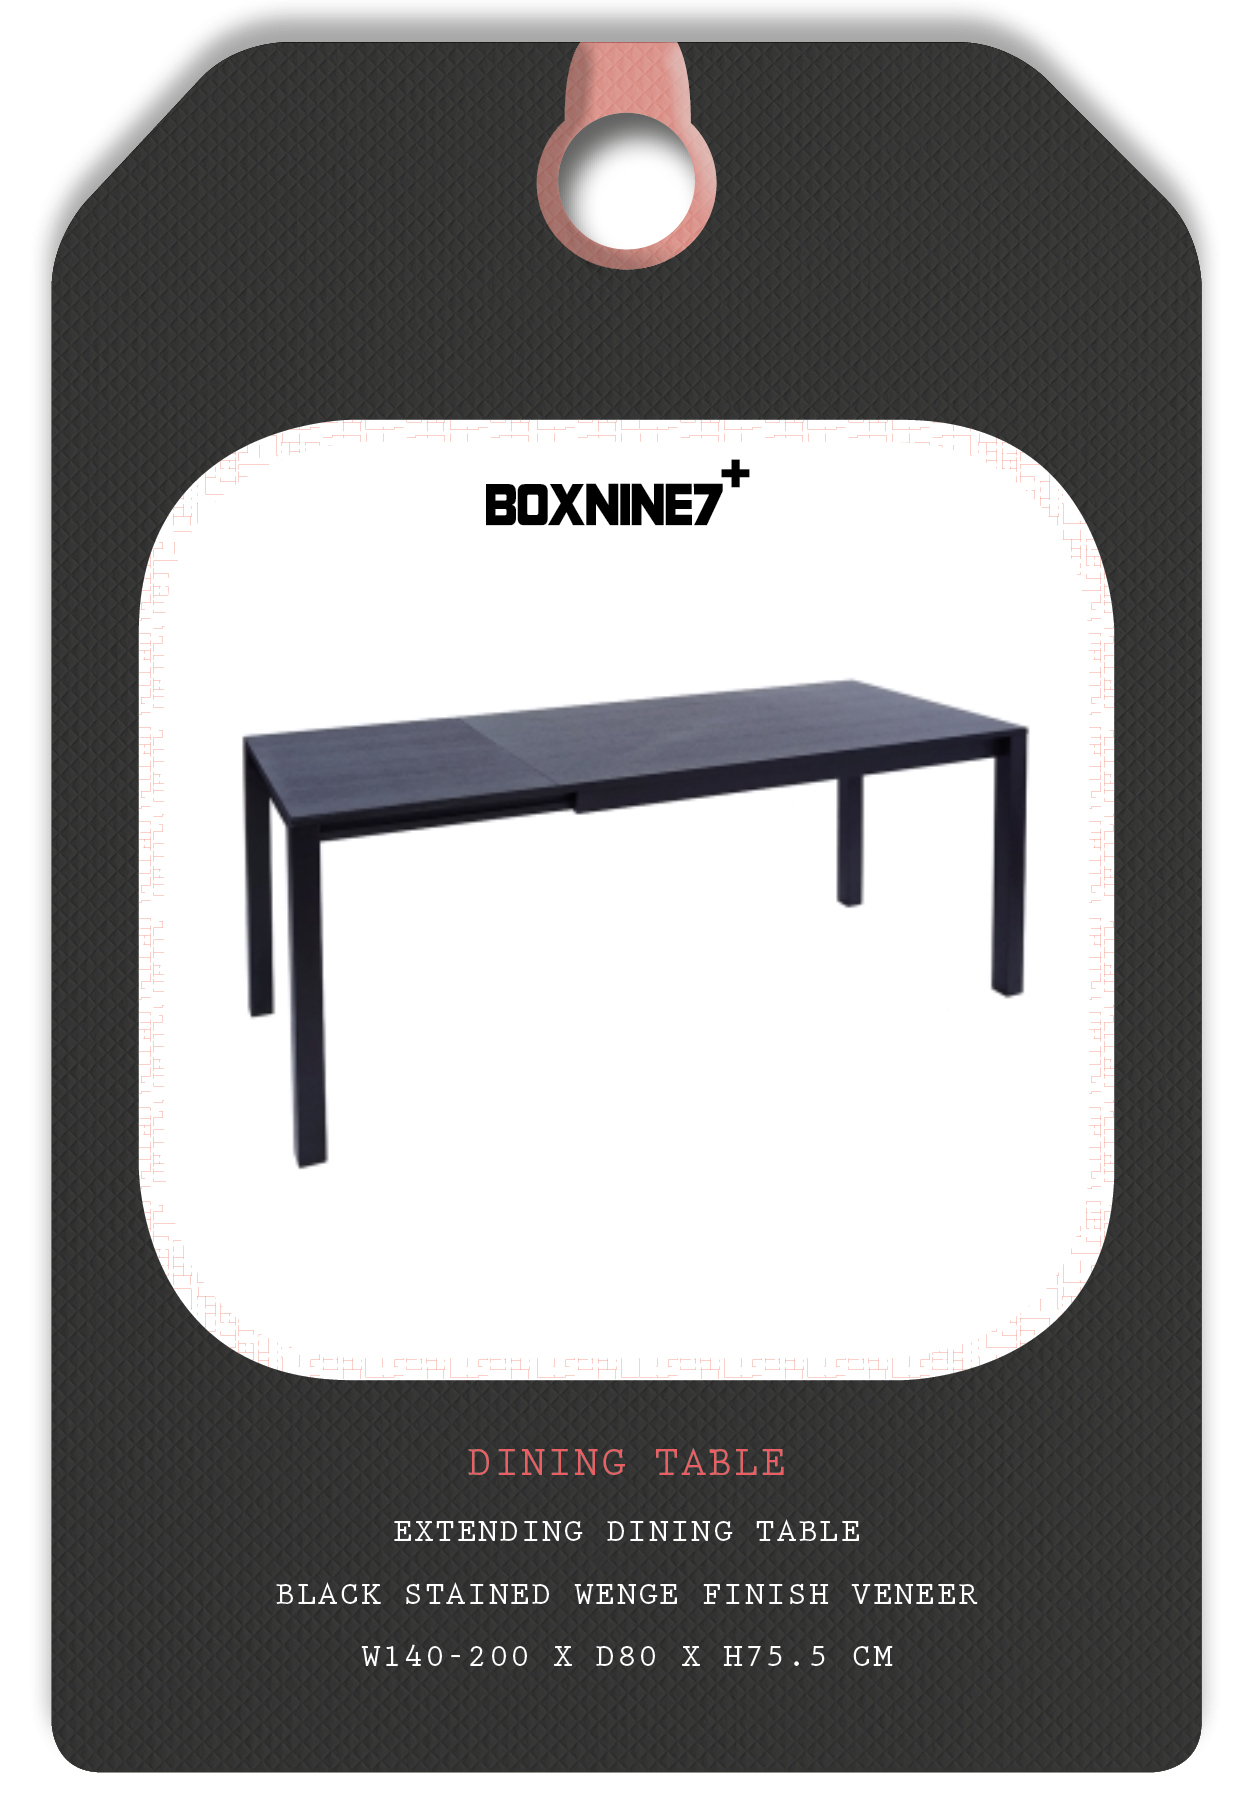 Dining Table - 6 - B.jpg